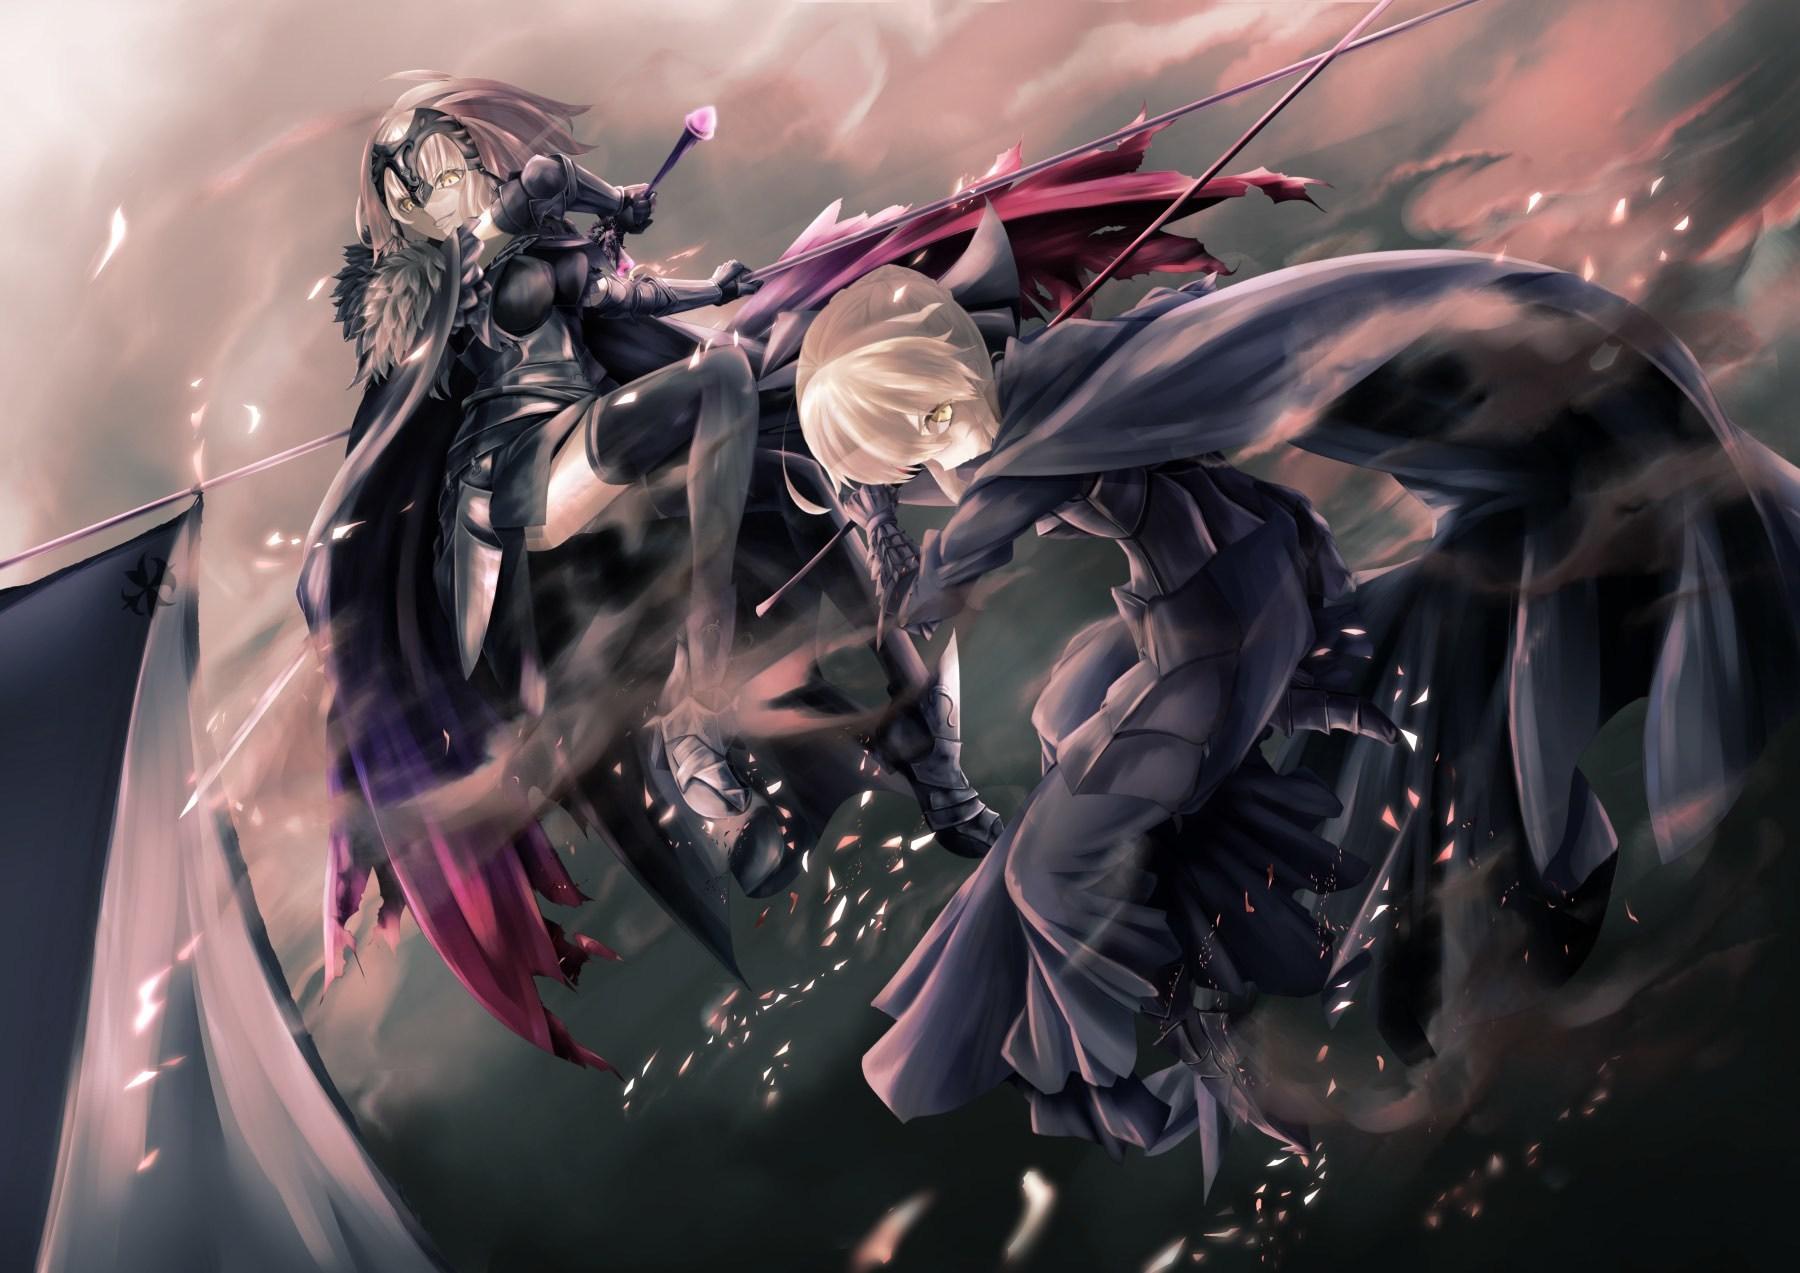 Fate セイバー オルタ 壁紙 Fate セイバー オルタ 壁紙 最高のディズニー画像